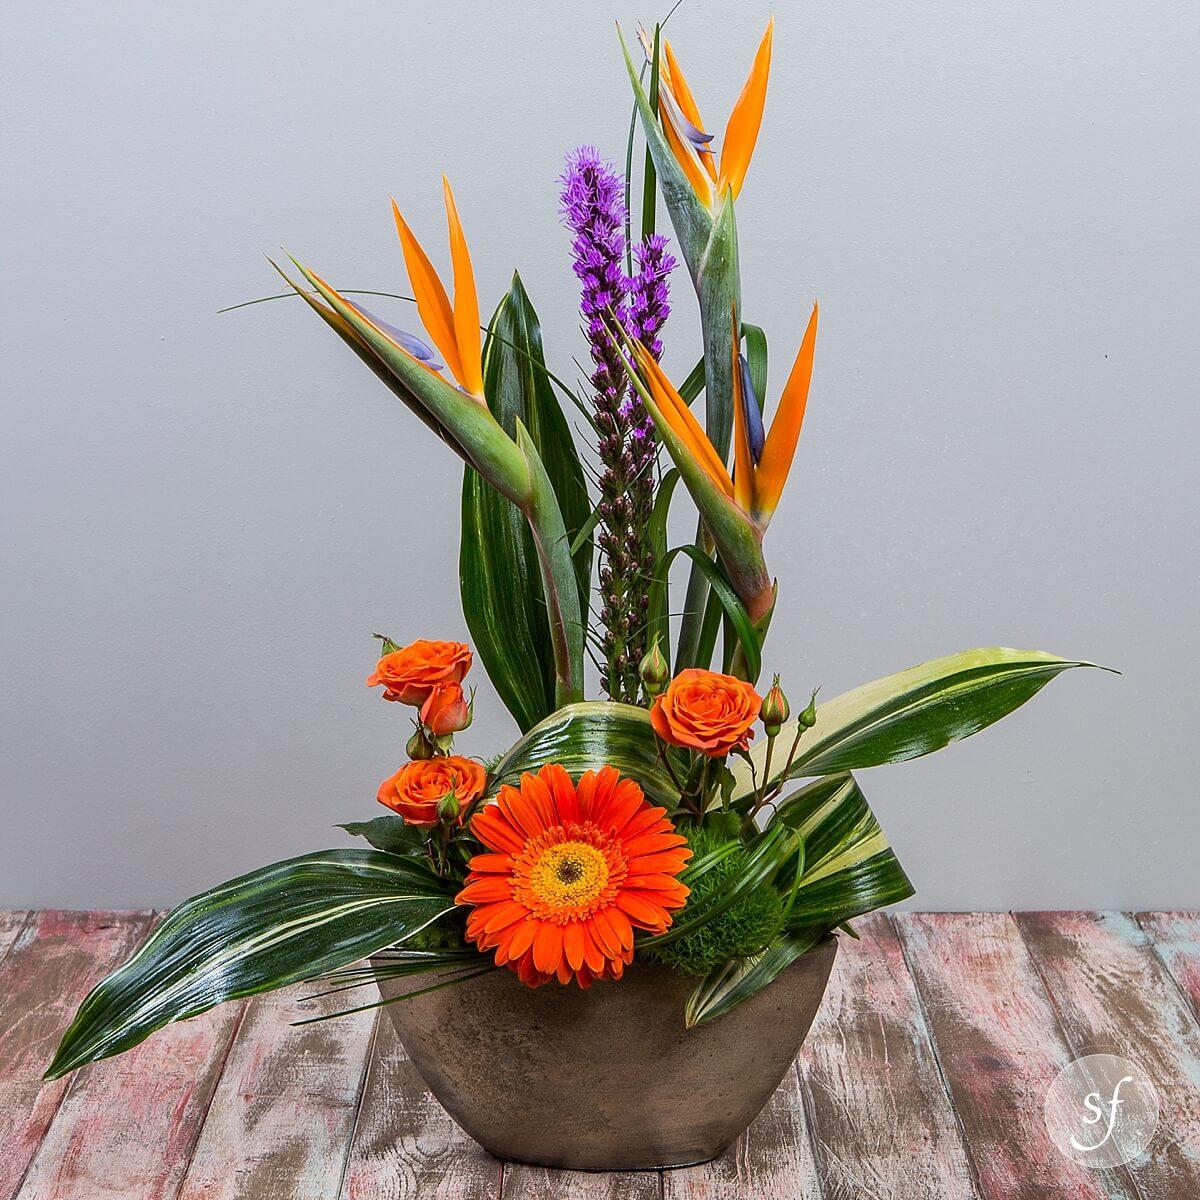 Tropical Paradise - Flower Collection, Tropical - Steve\'s Floral